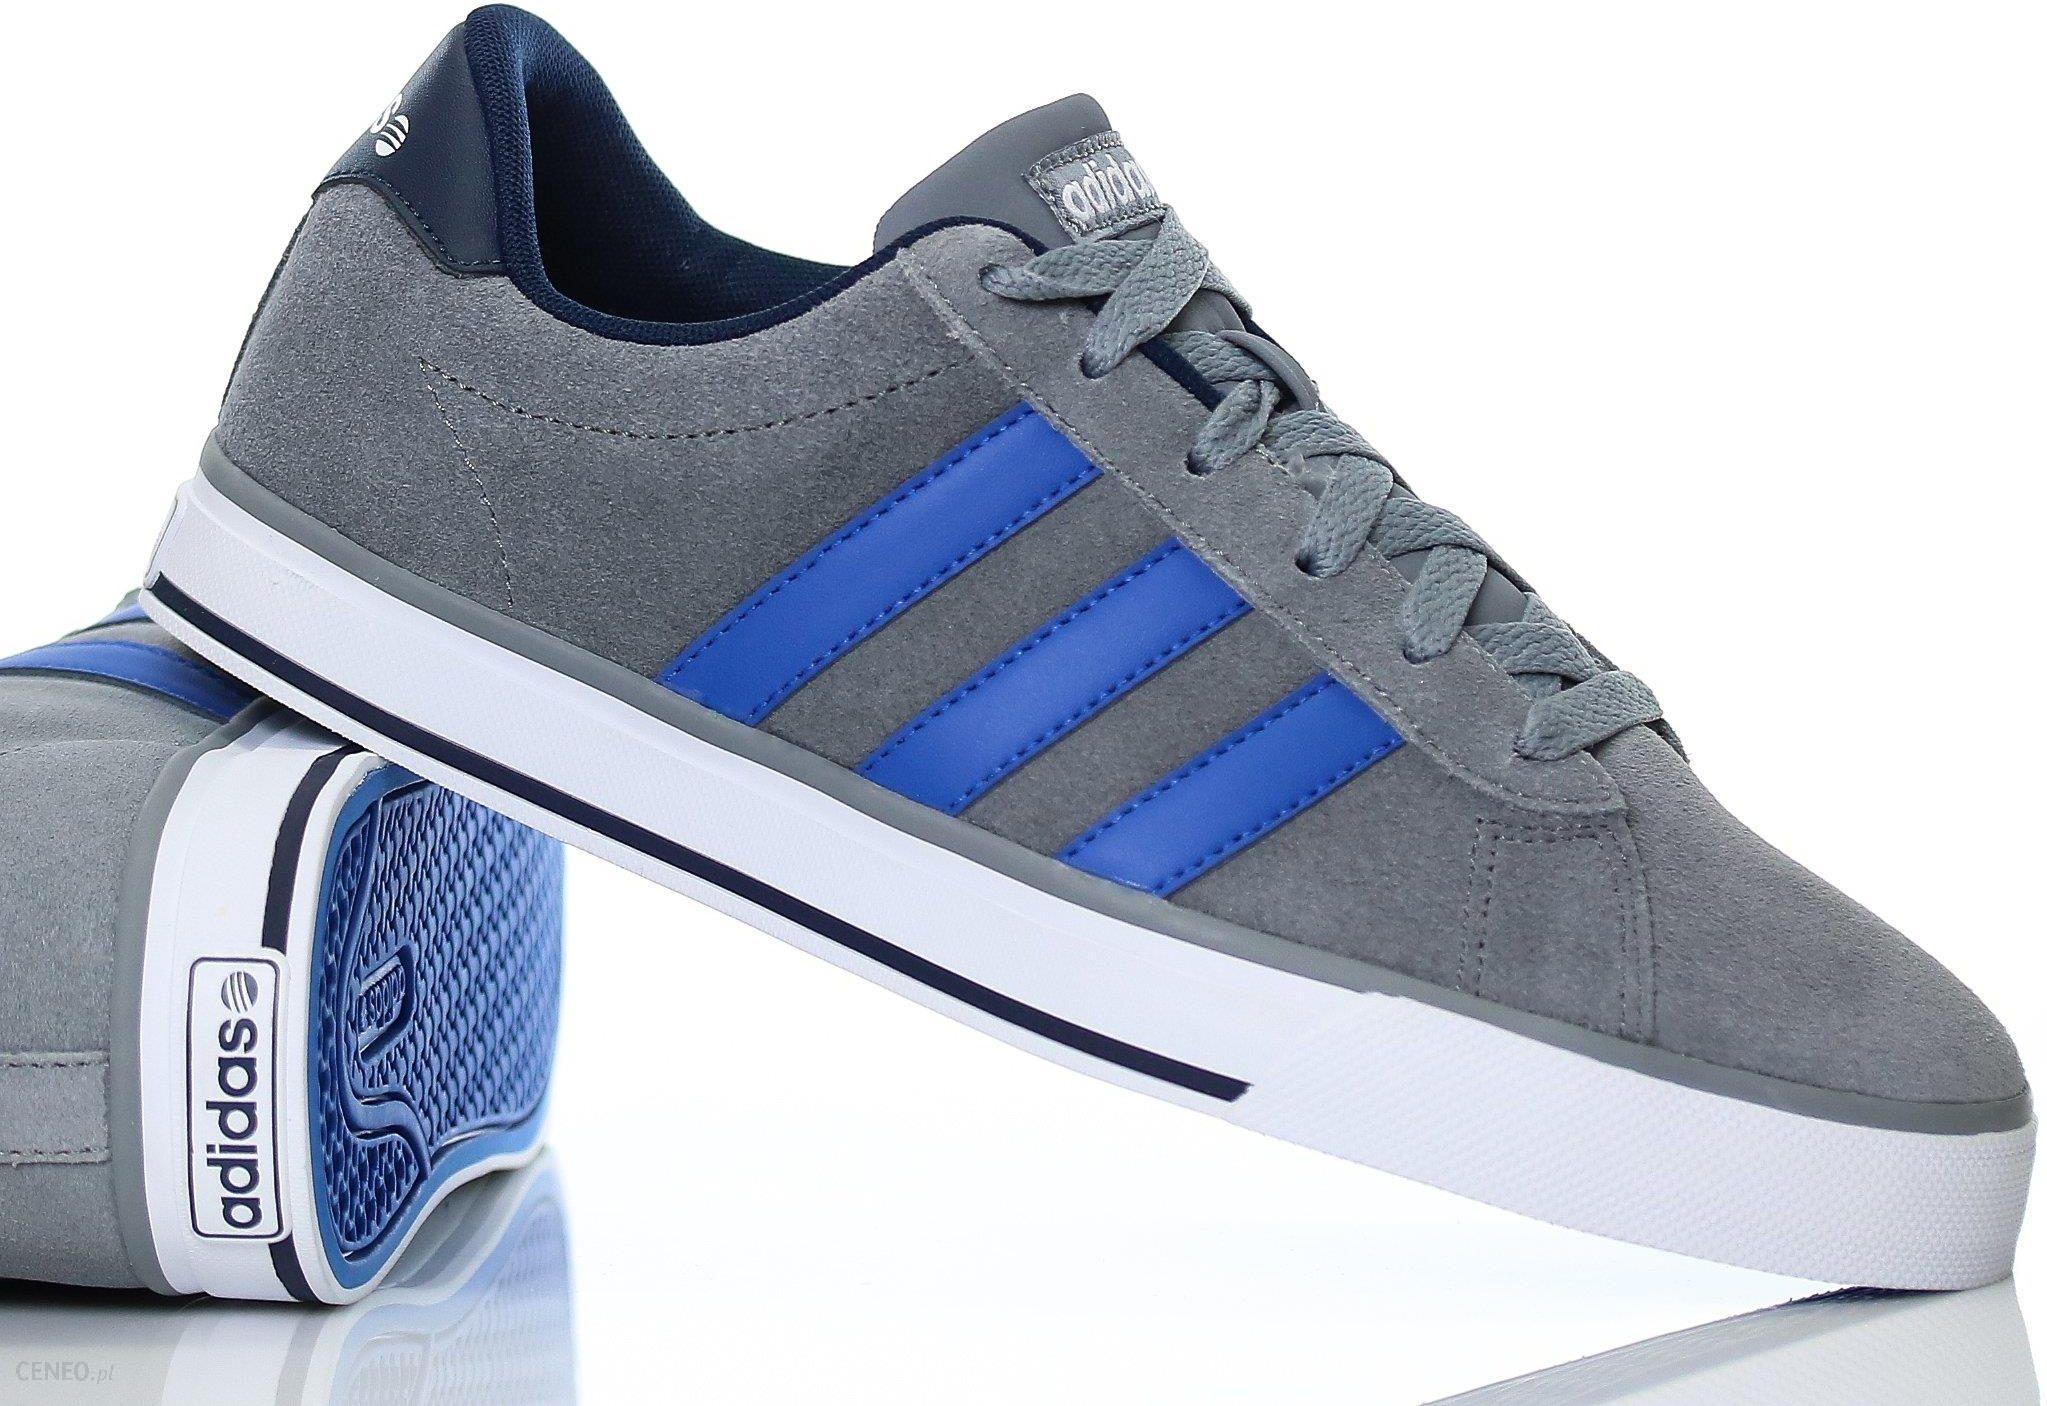 c6c70a3c Buty męskie Adidas Daily F98336 r.40 i inne r. - Ceny i opinie ...